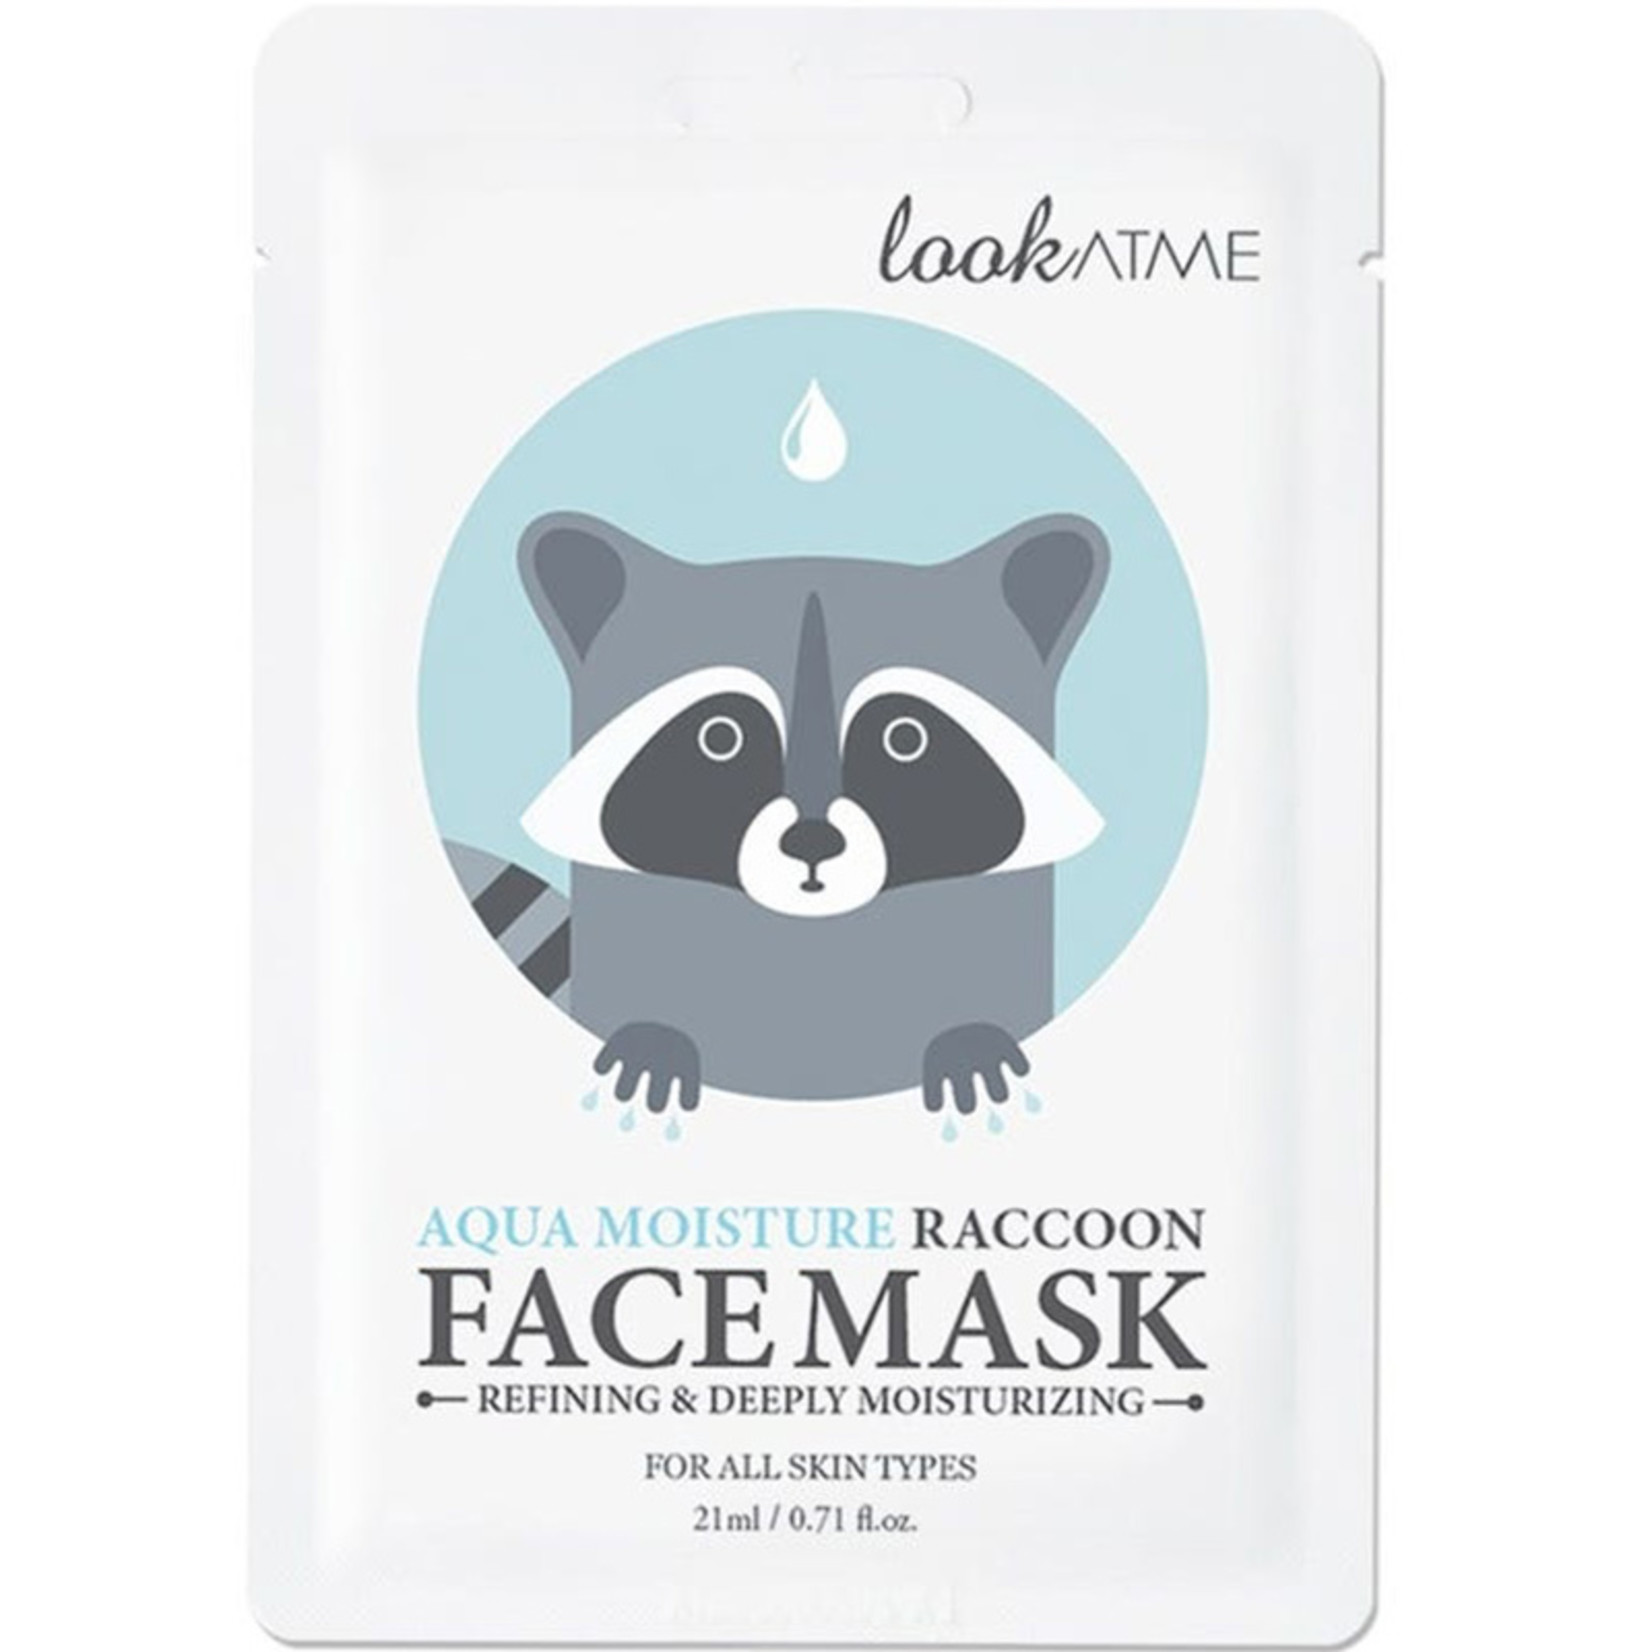 lookATME Aqua Moisture Raccoon Face Mask